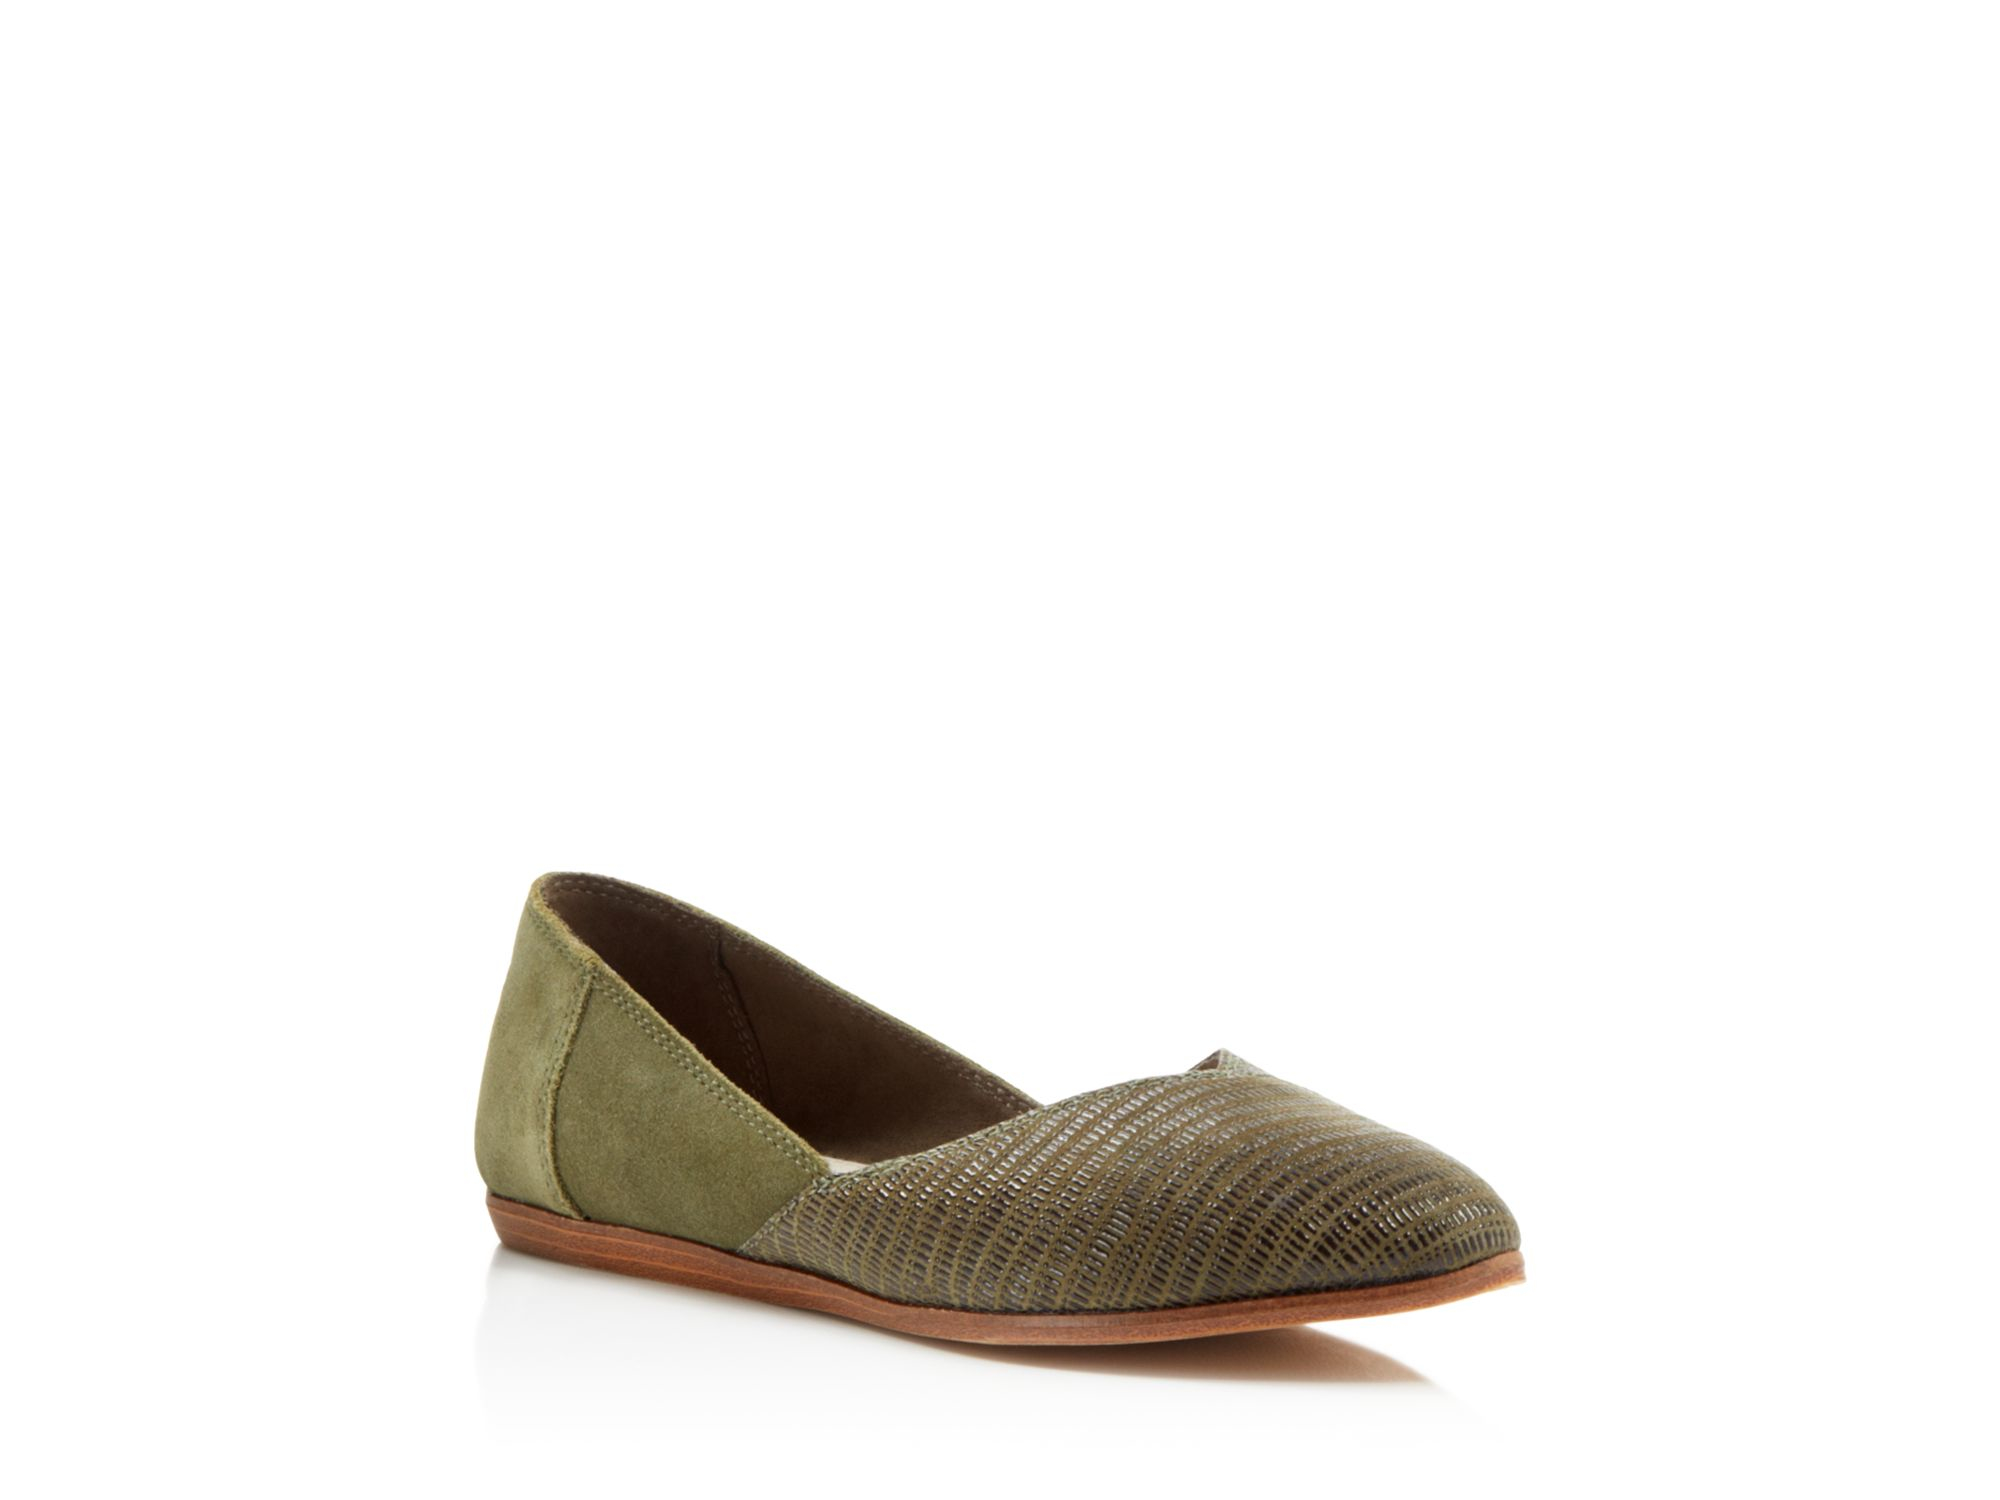 Jutti Shoes Uk